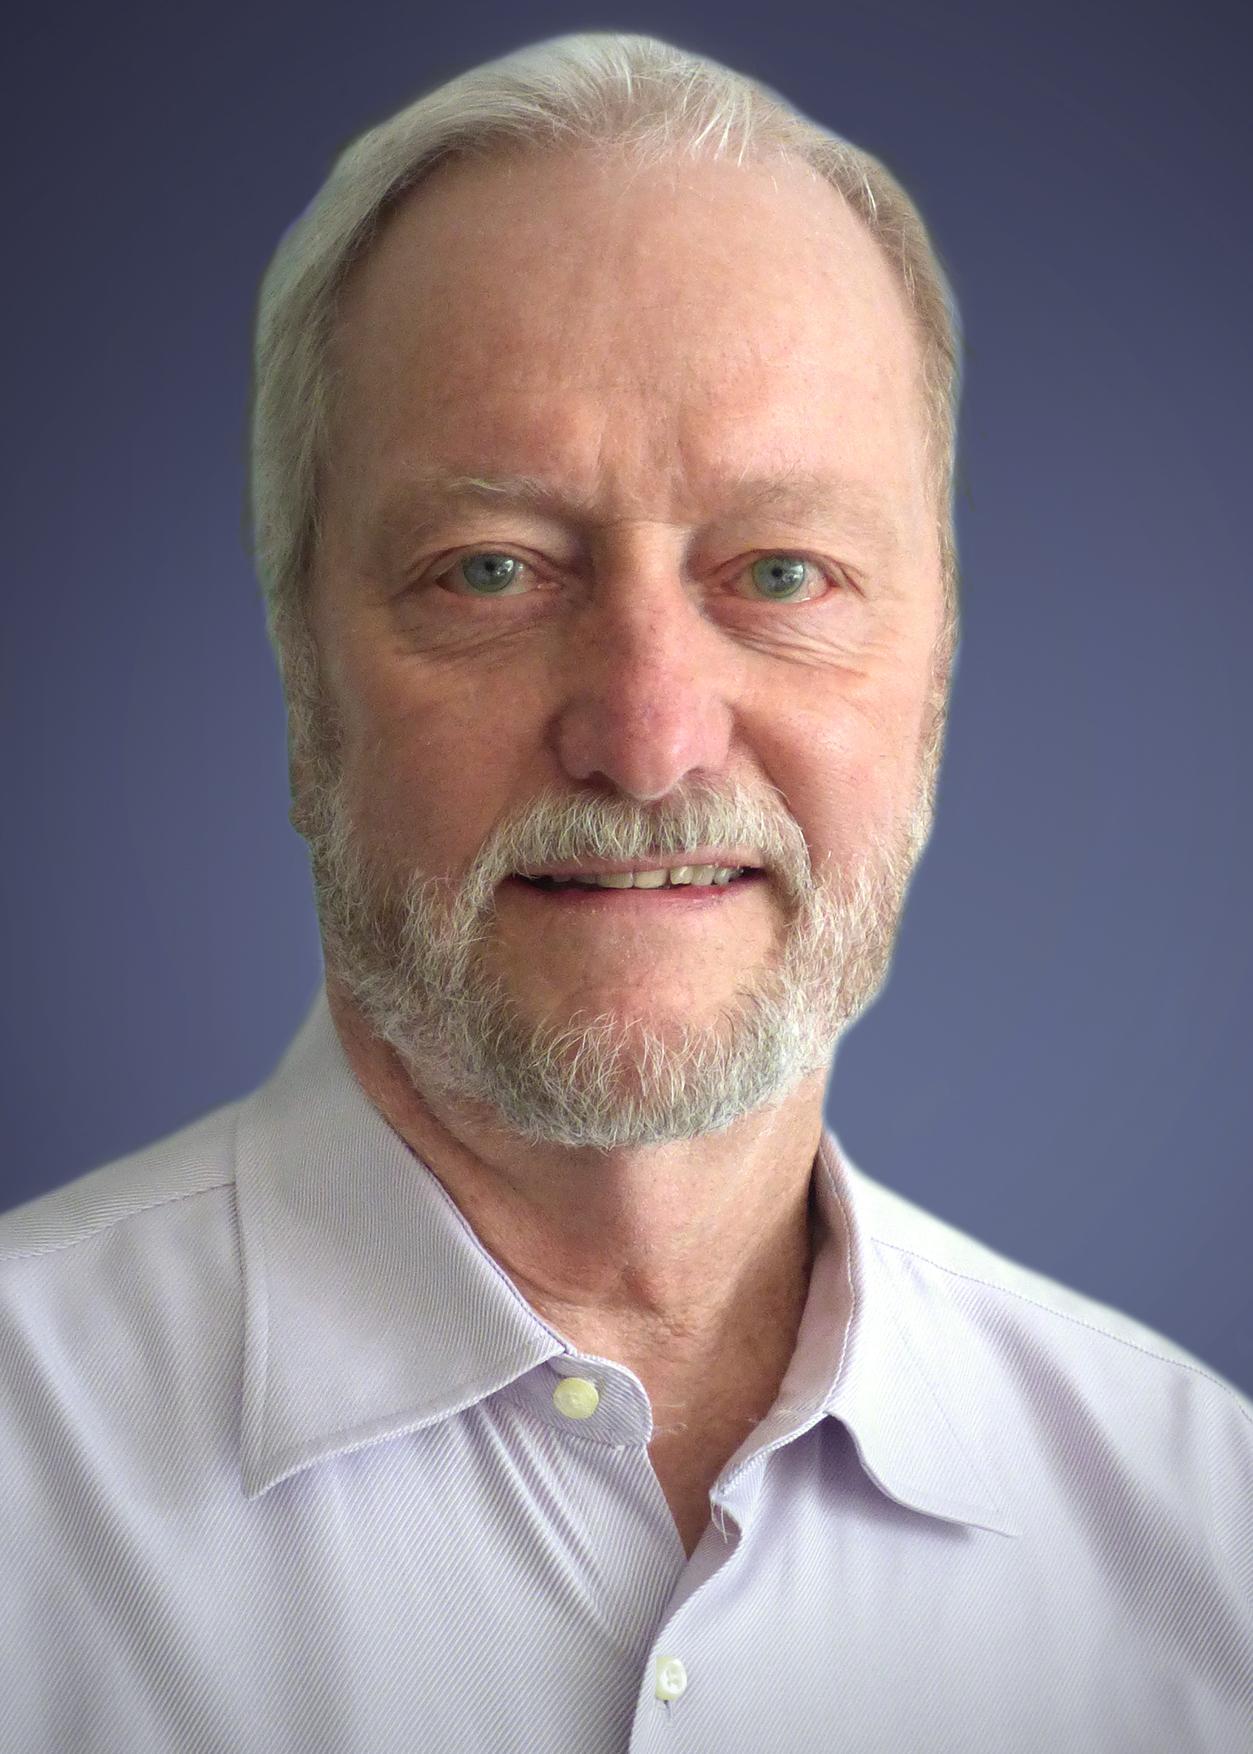 Marv White